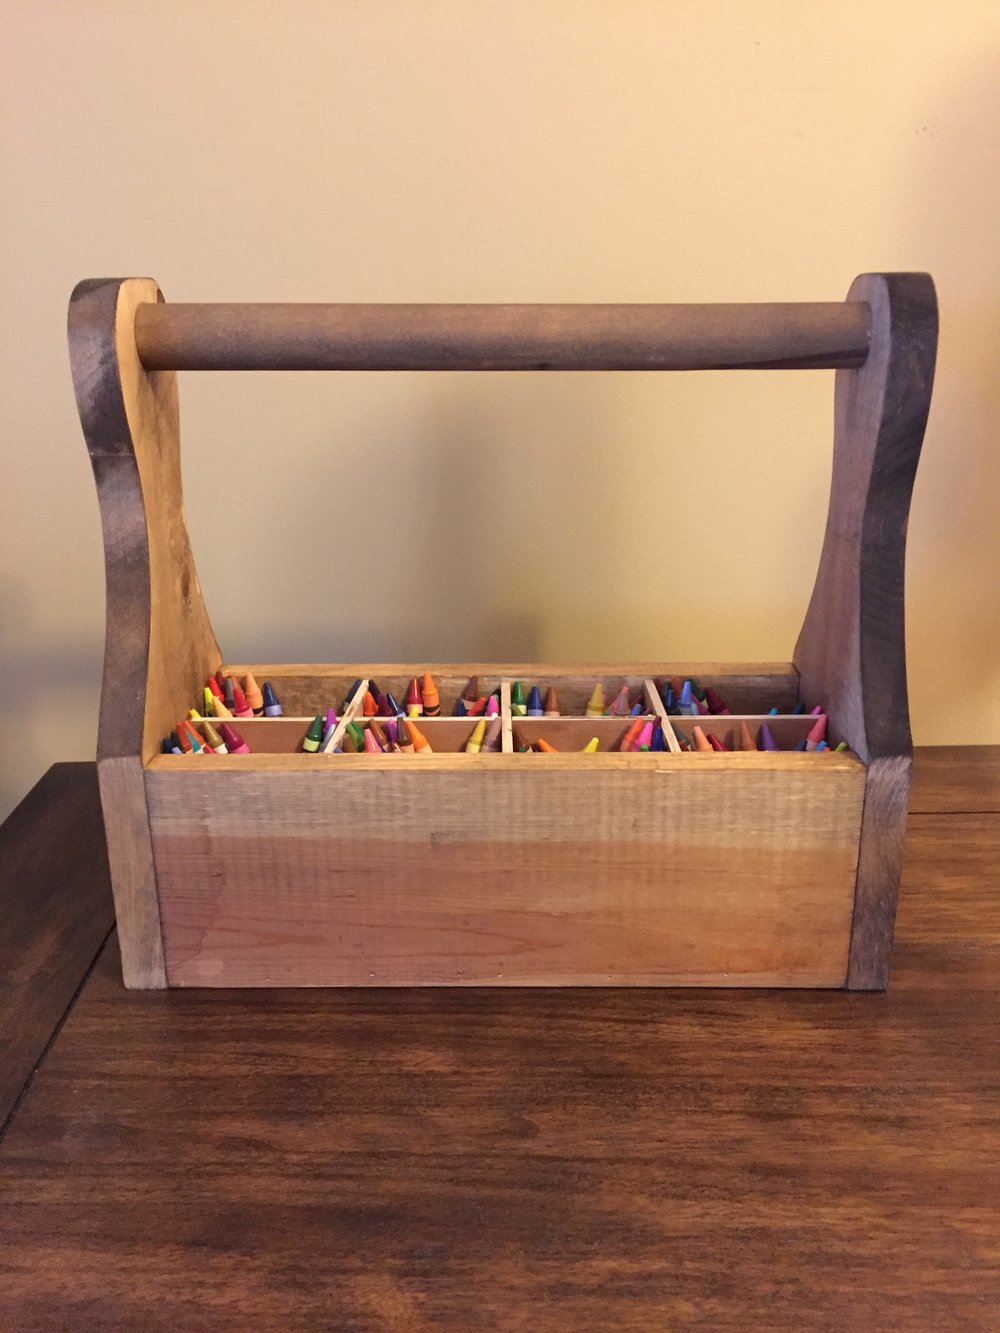 crayon-box-side.jpg